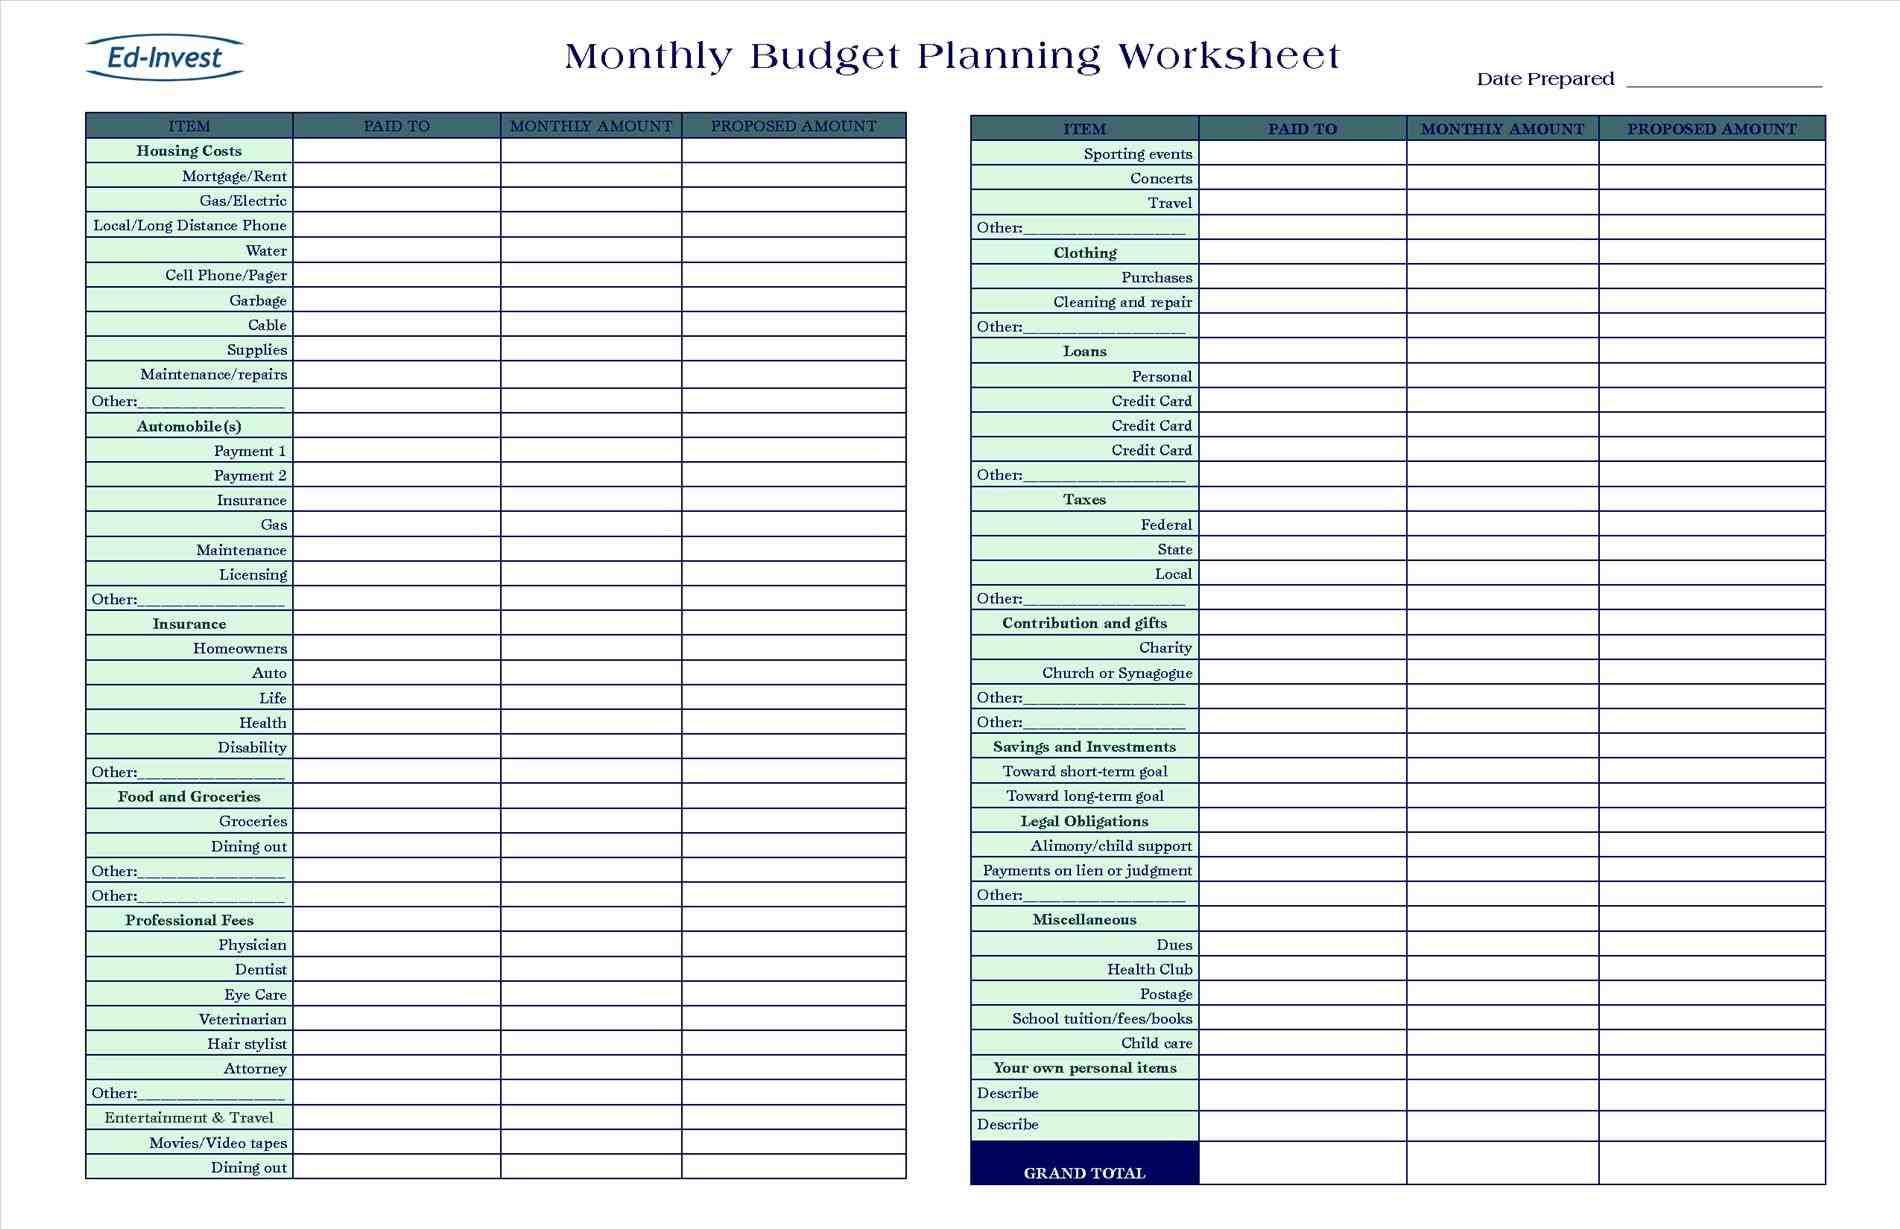 planning commonpenceco budget Any Event Expense Calculator Sheet planning sheet commonpenceco party expenses spreadsheet laobingkaisuocom party Any Event Expense Calculator